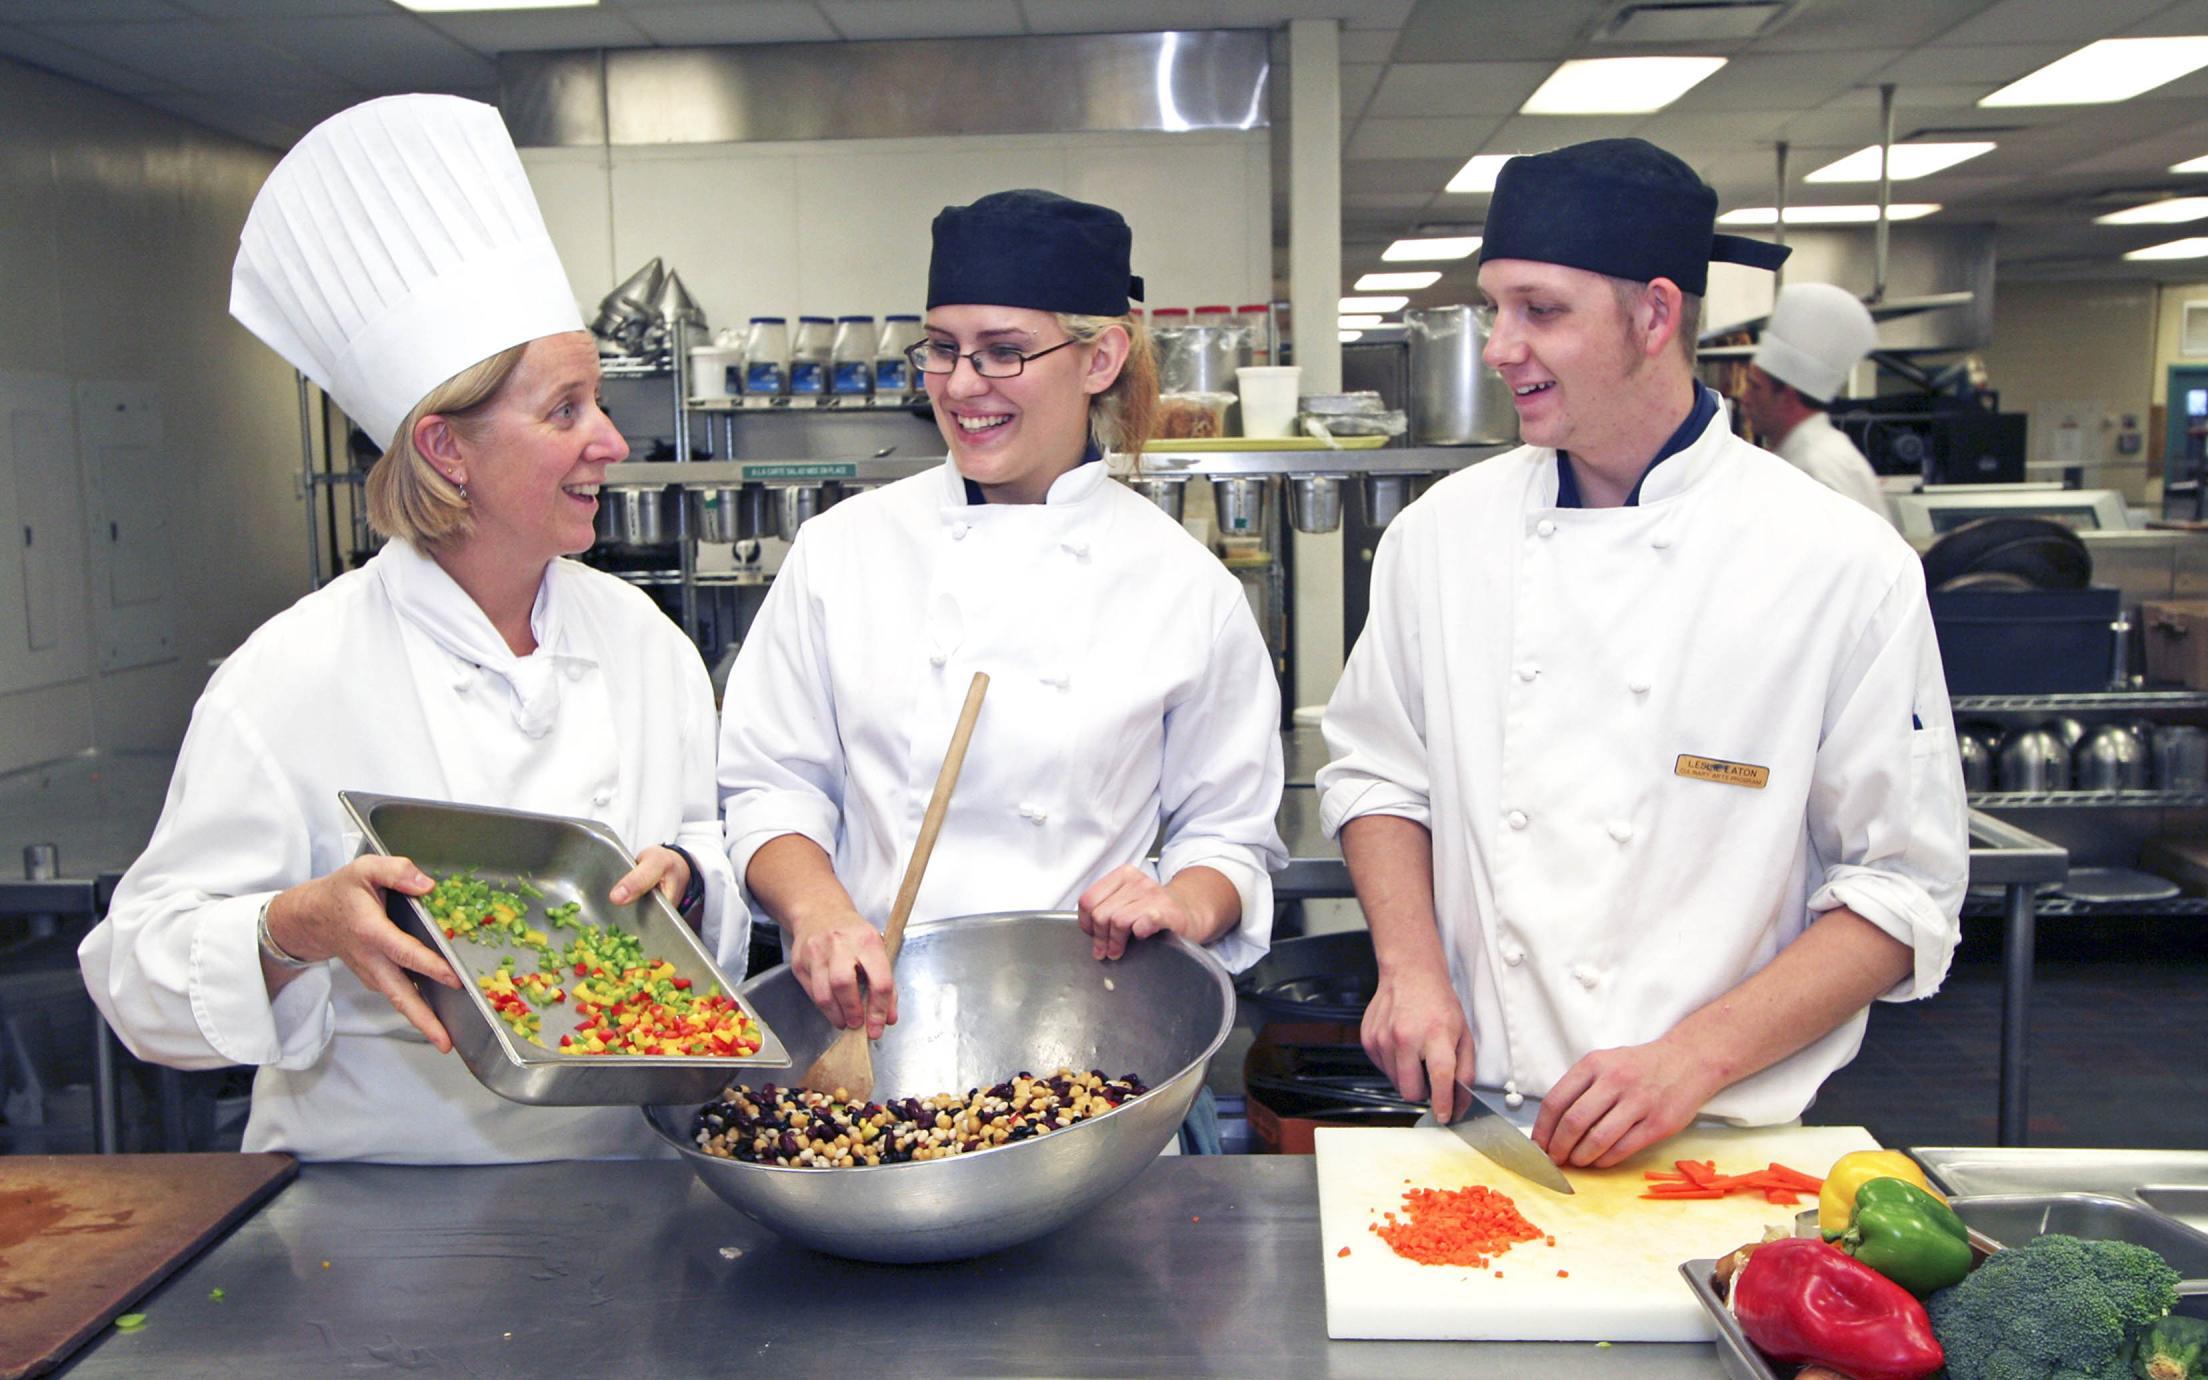 Three students of the Culinary Arts program at VIU's Culinary School